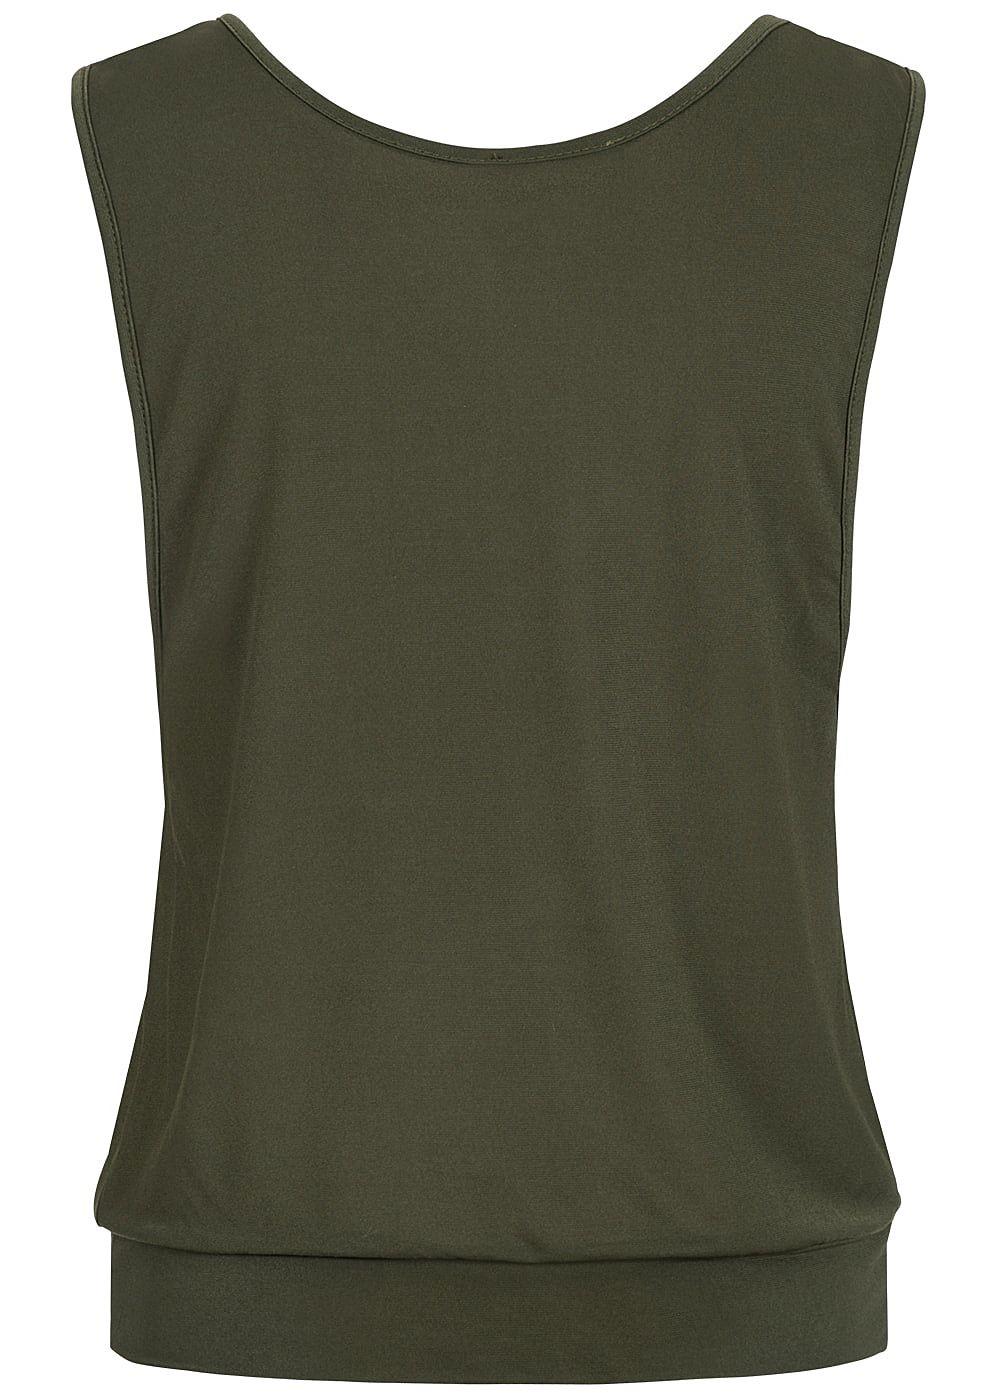 0ebbd487230019 Styleboom Fashion Damen Loose Tank Top Traumfänger Print military ...